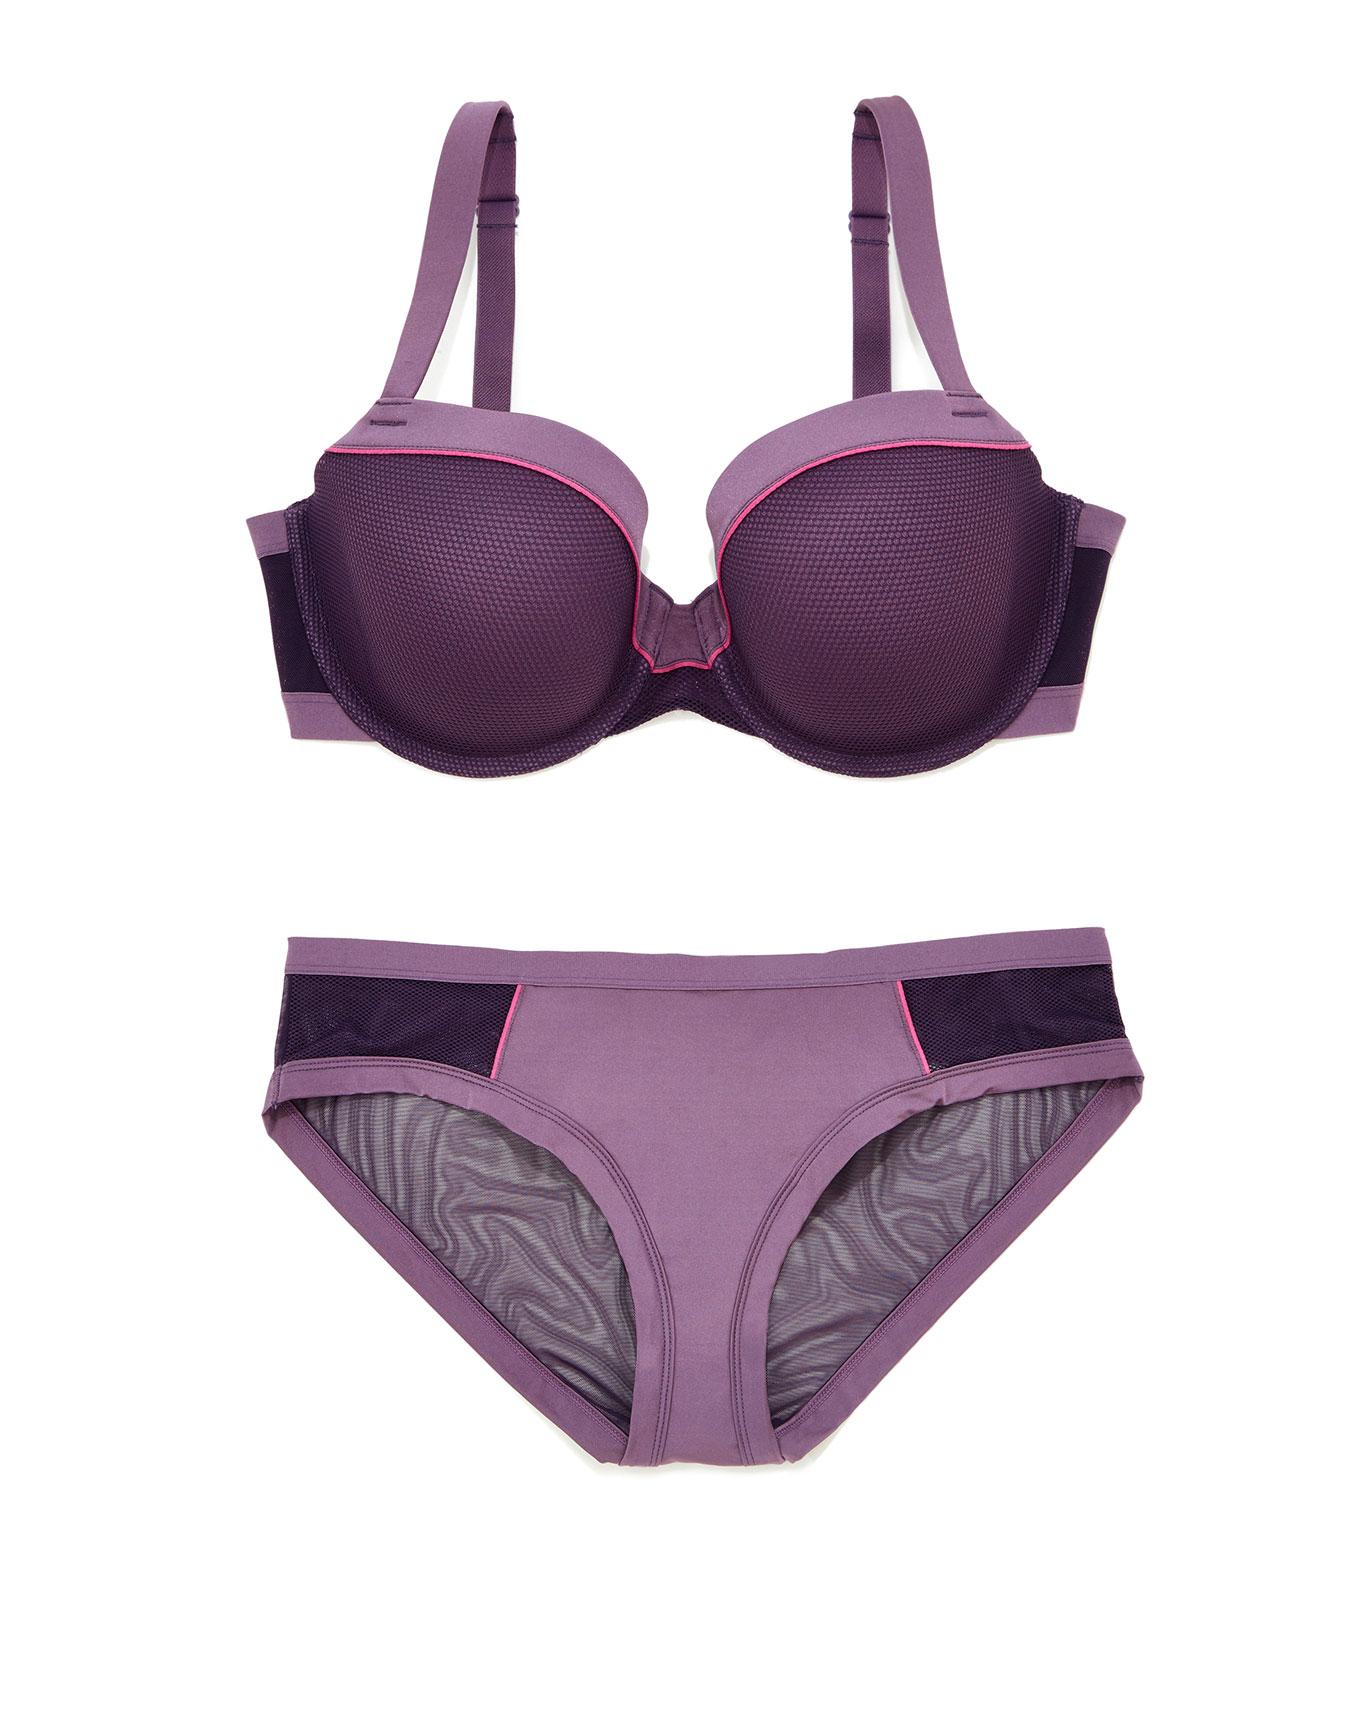 fa17_still_tebby_contour_plus_high_waist_web_tebby-purple-contour-balconette-bra-for-plus-women.jpg